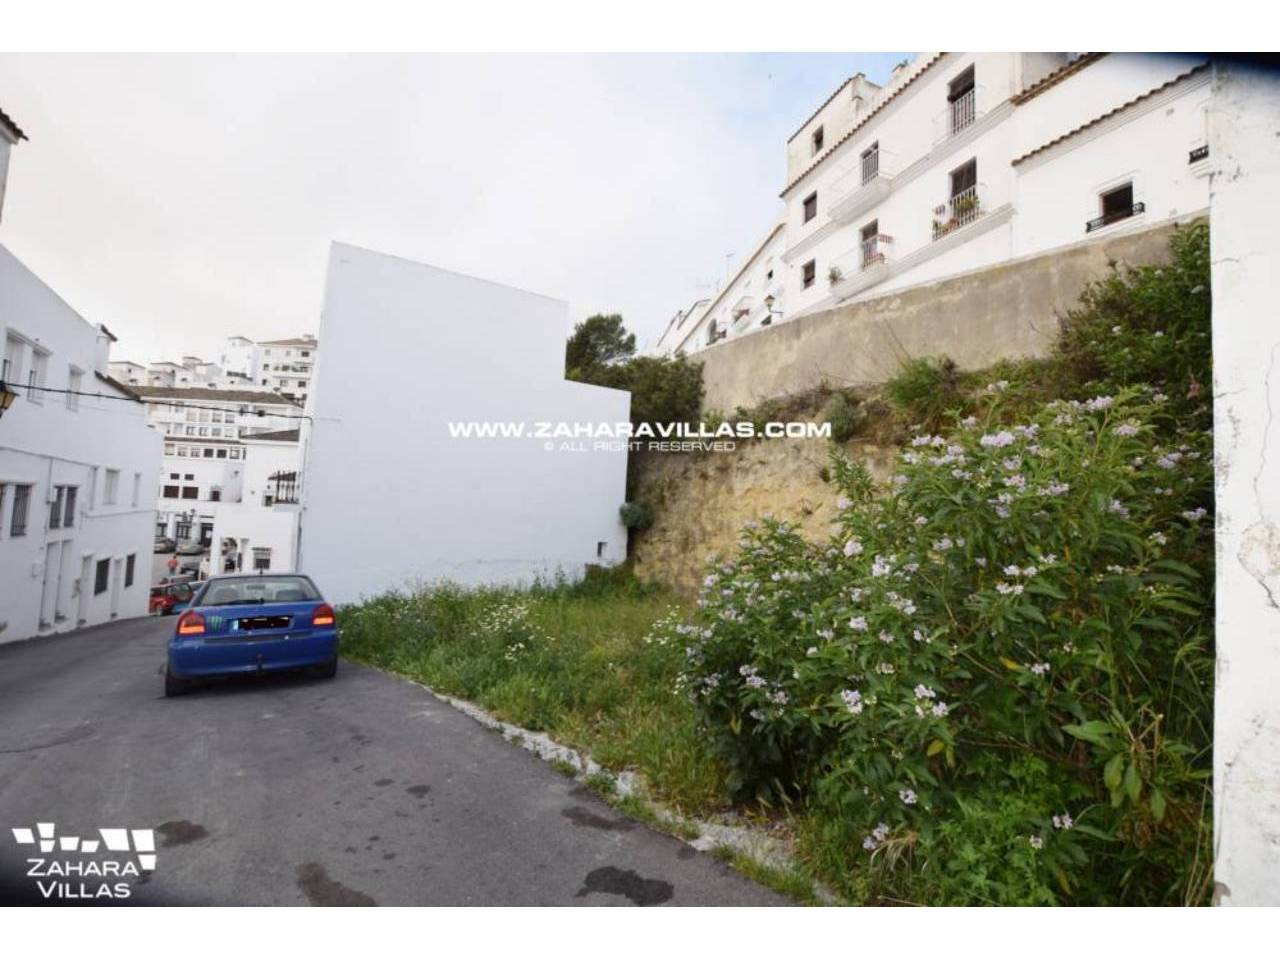 Imagen 2 de Parcela Urbana con Proyecto Básico de Edificación para 4 Pisos